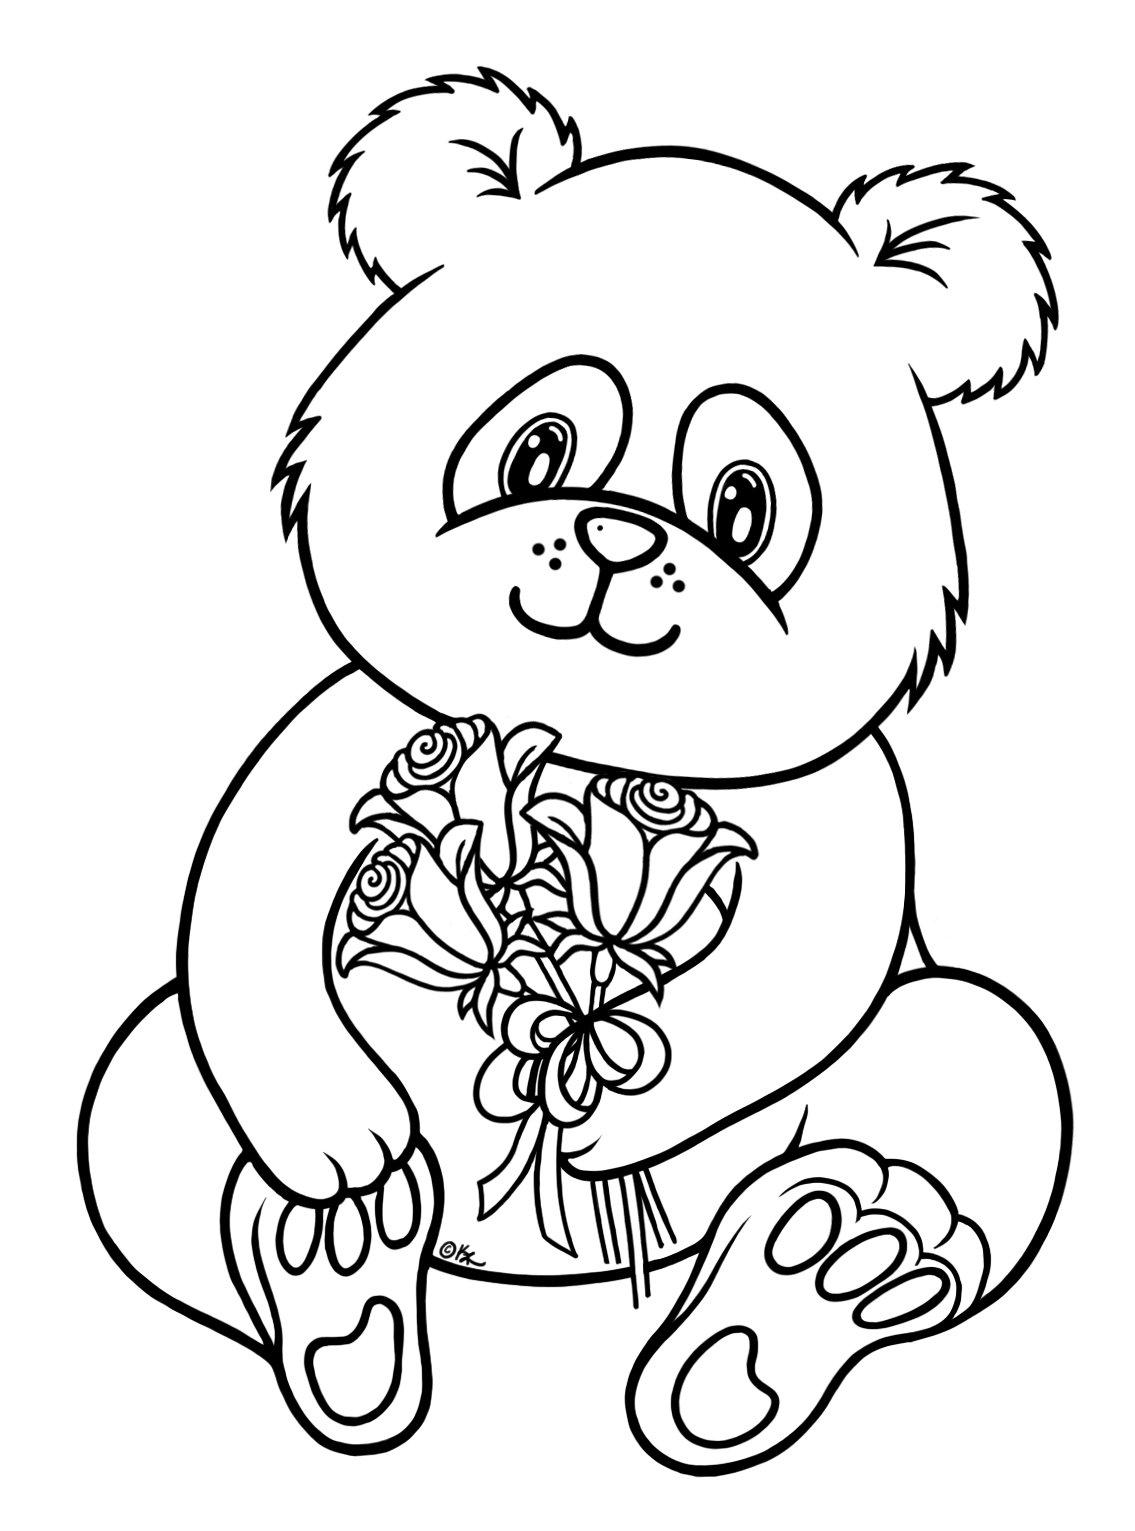 Panda Bear Coloring Page   Wallpaper Download